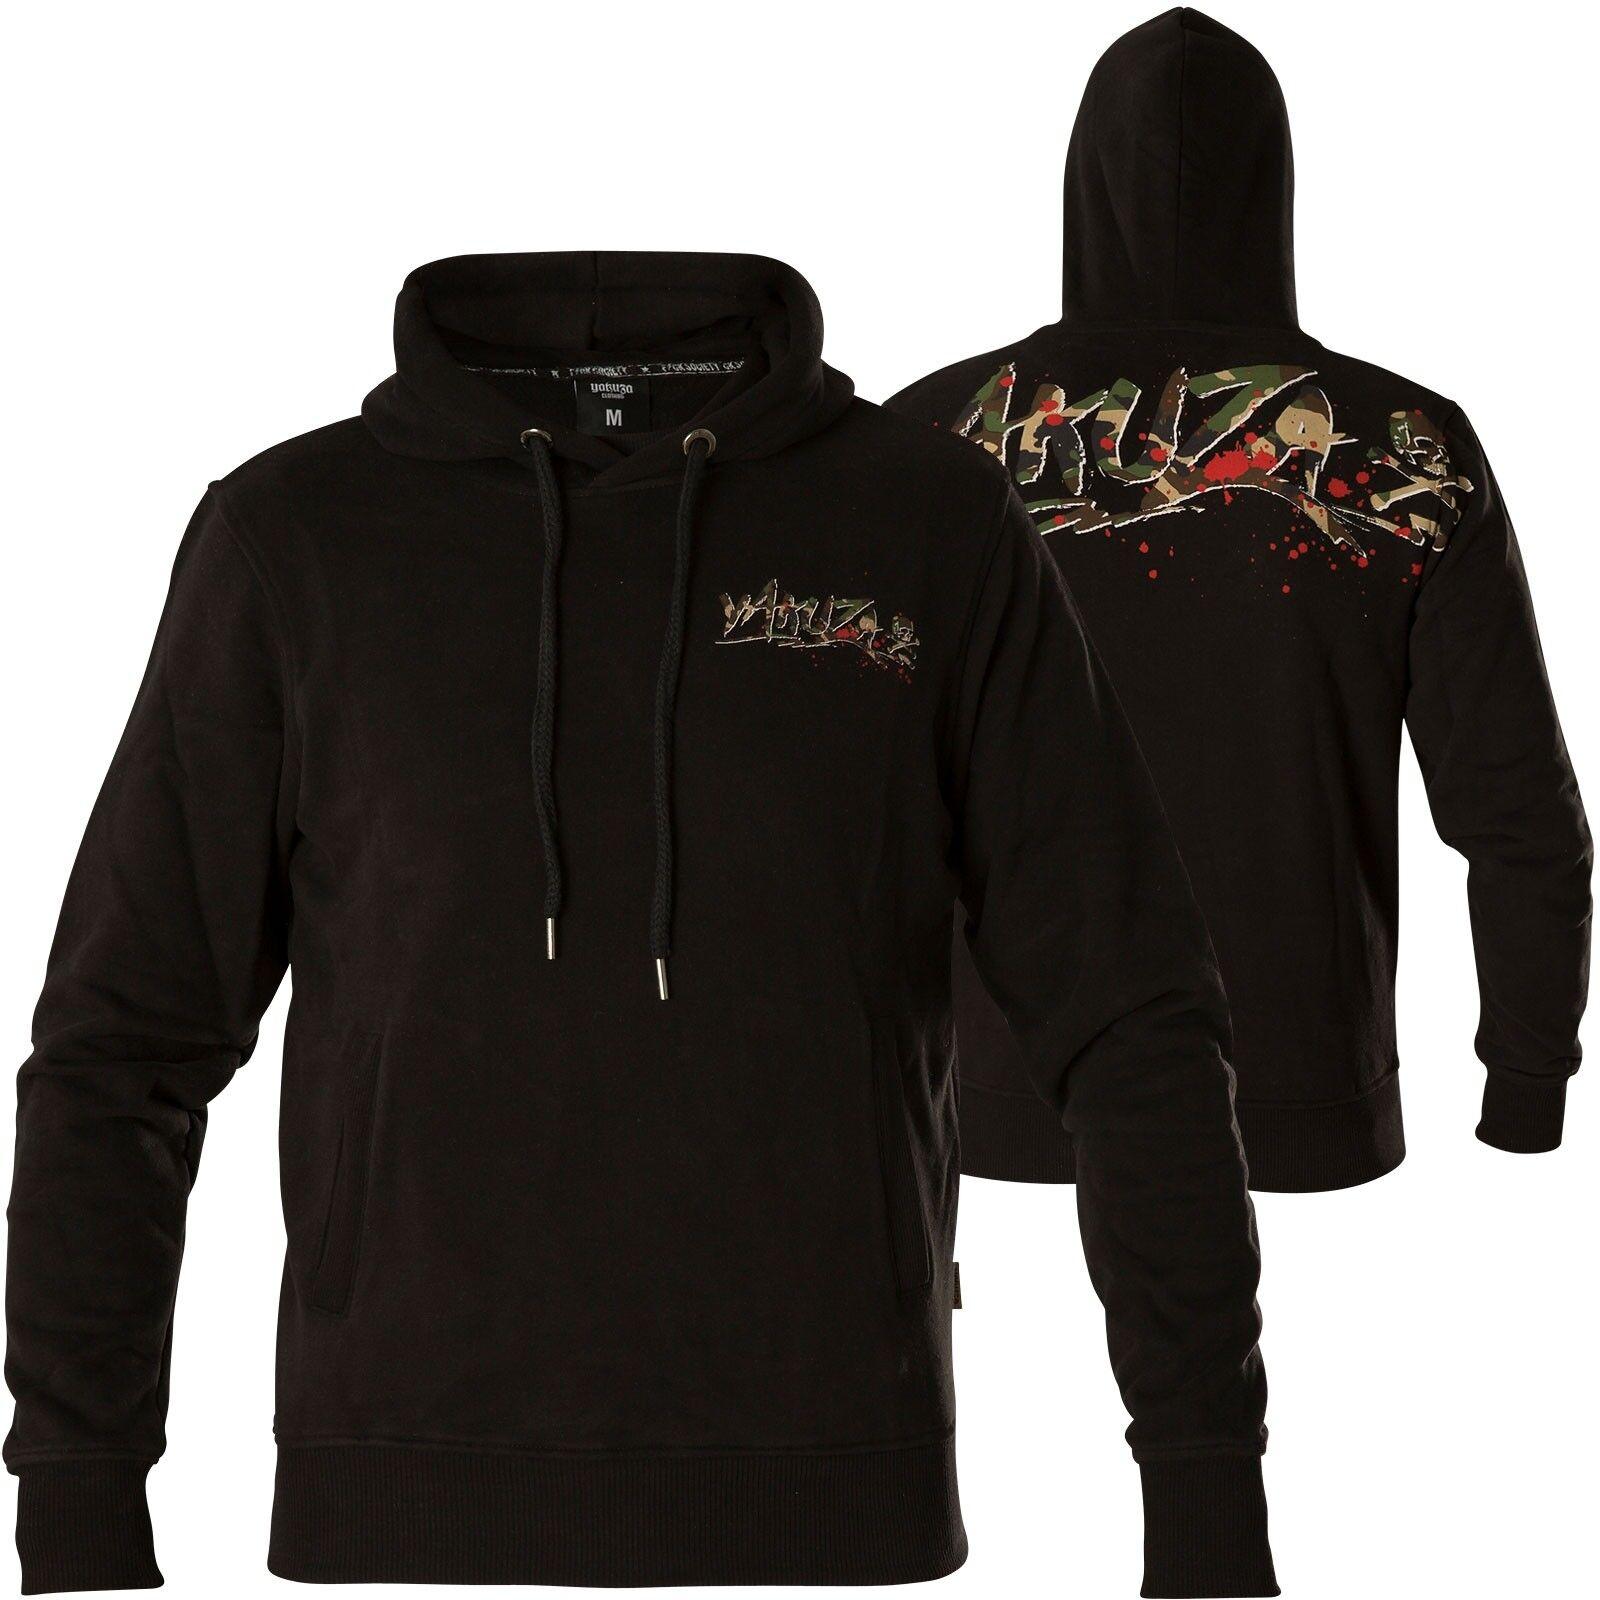 YAKUZA Hoody Trophy HOB-13055 schwarz Schwarz Hoodies Herren  Sweatshirts